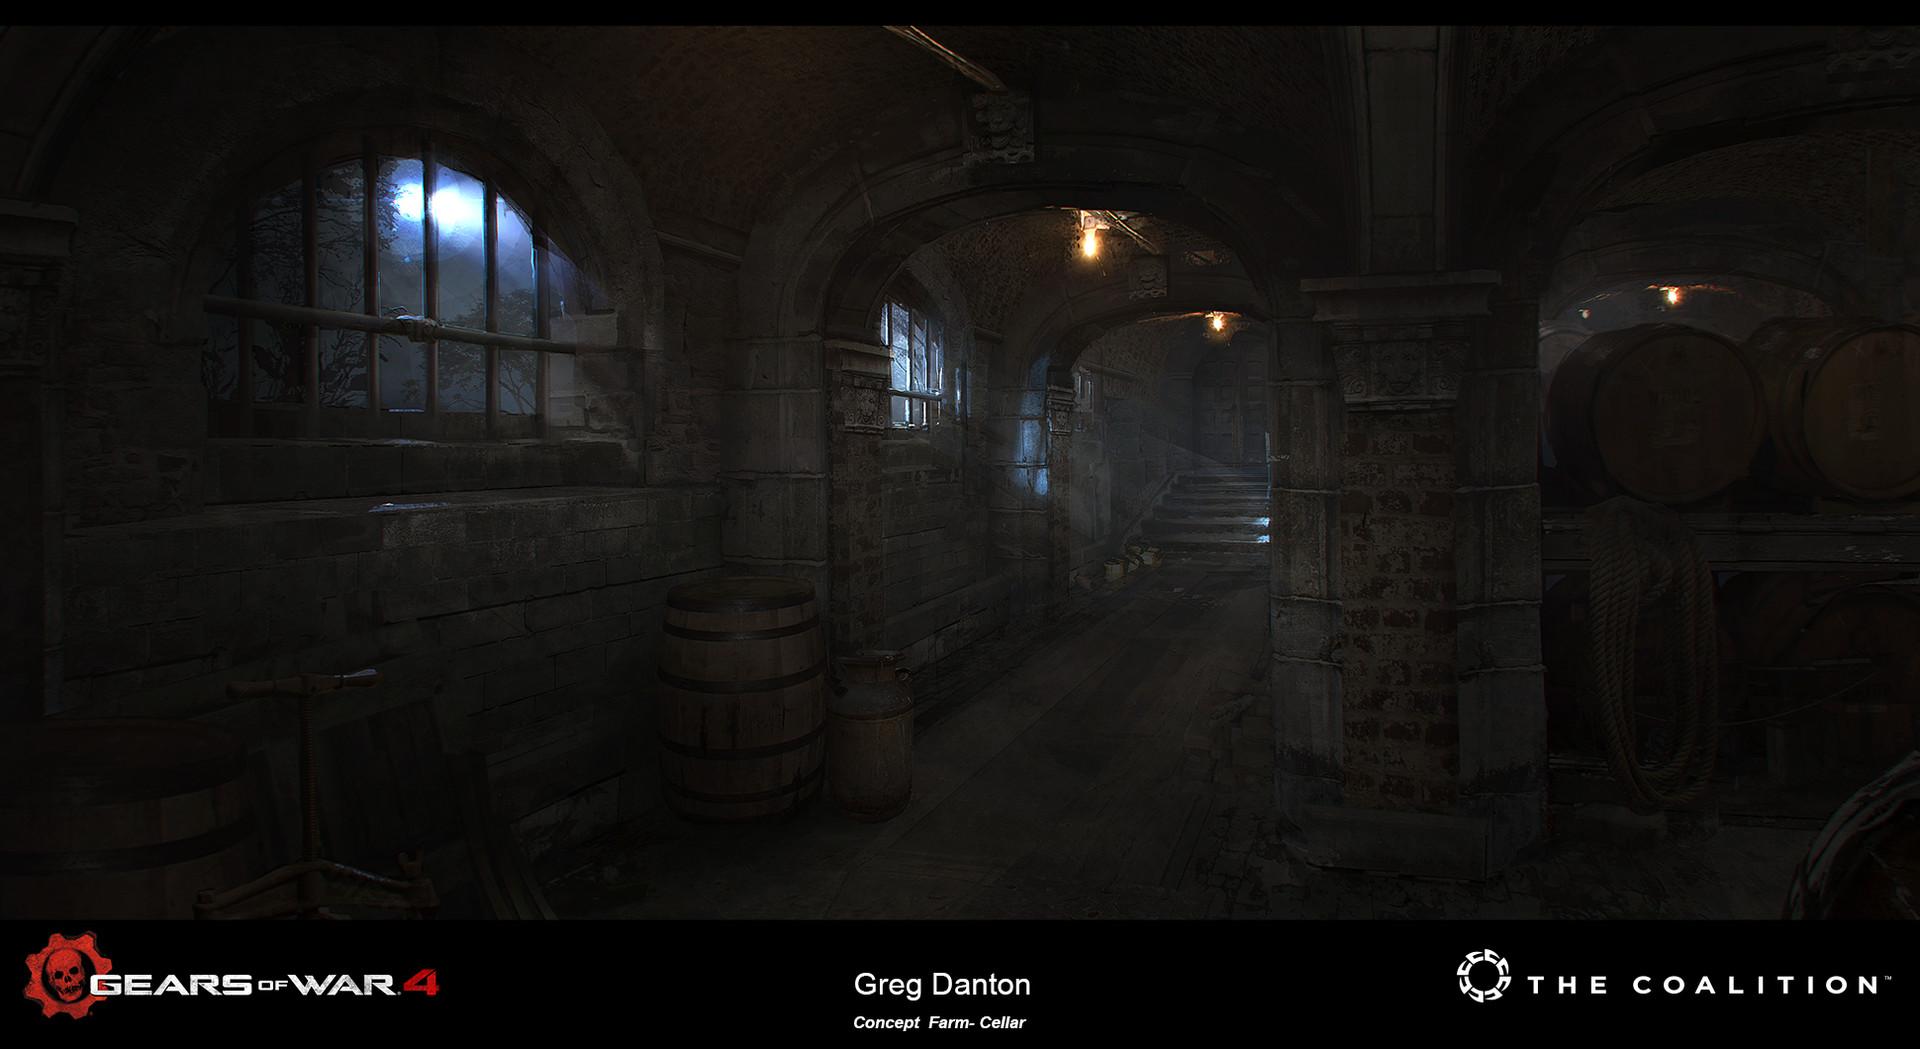 Greg danton art 27